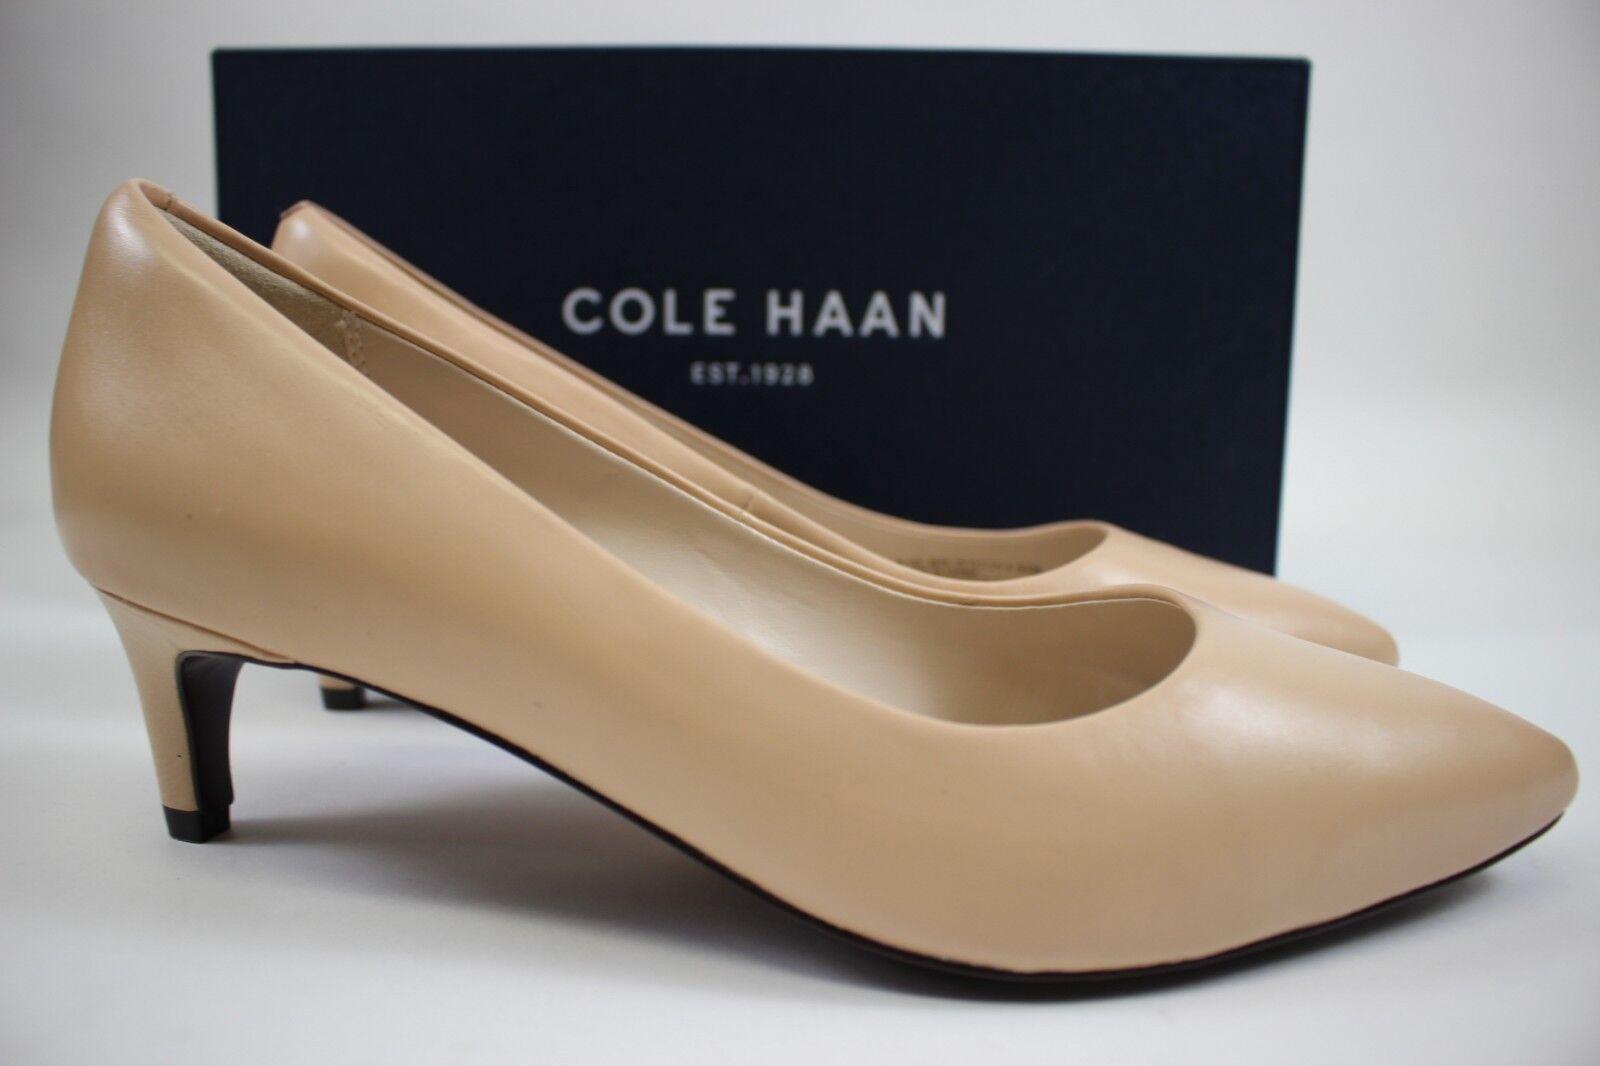 NIB COLE HAAN Size 9.5 Women's Nude 100% Leather AMELA GRAND 45MM Classic Pump